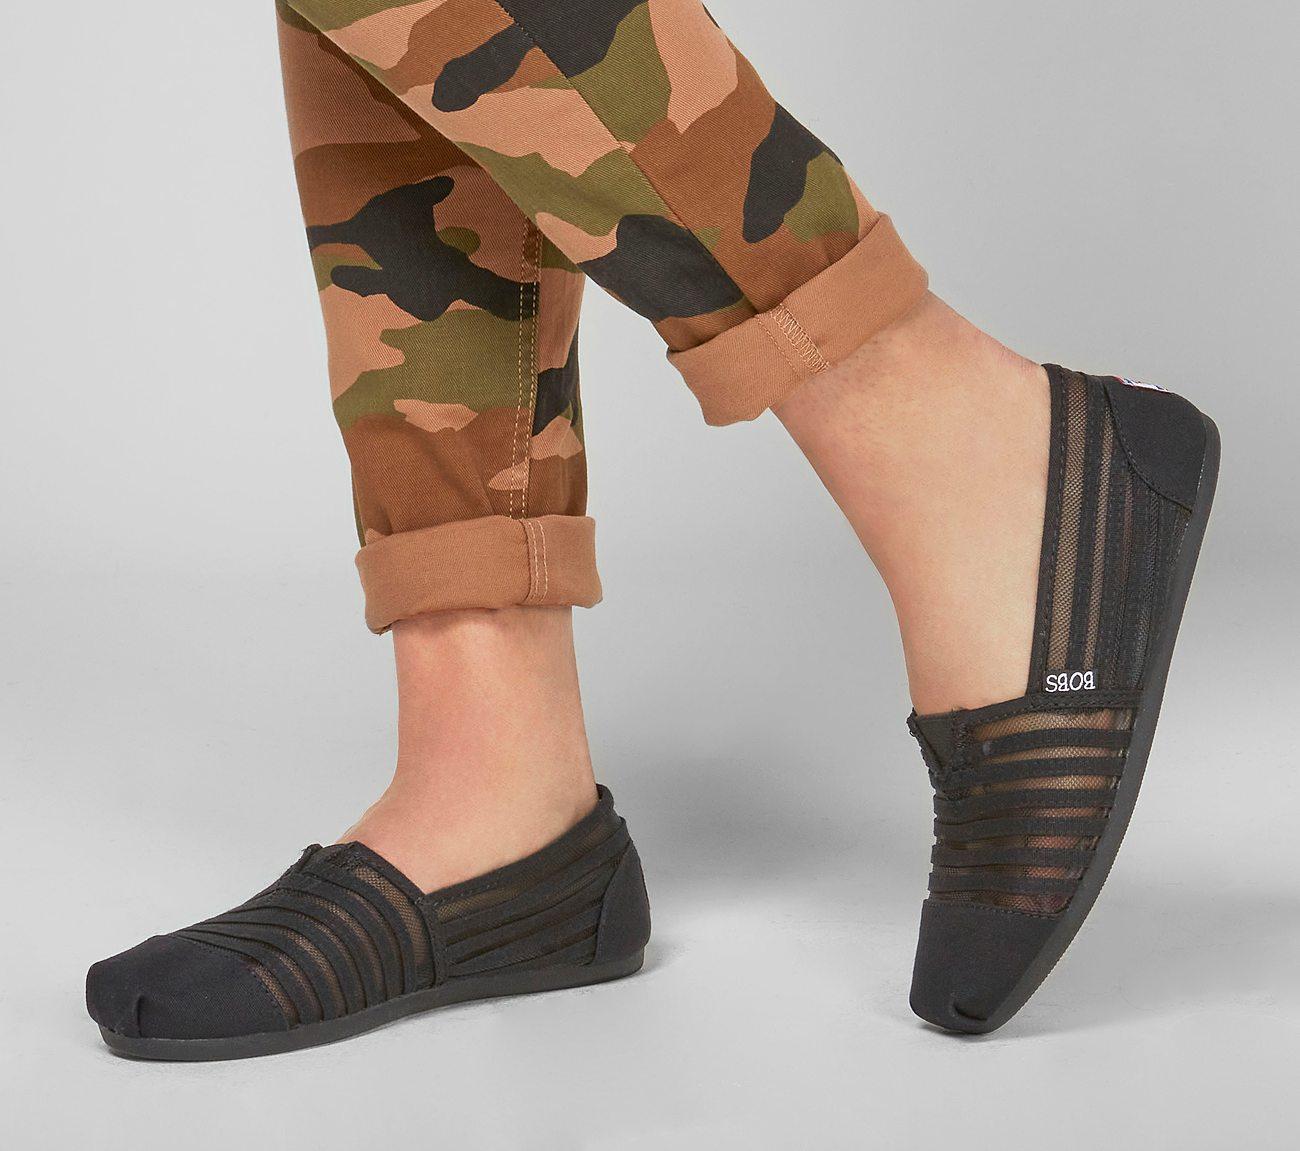 bob shoes where to buy